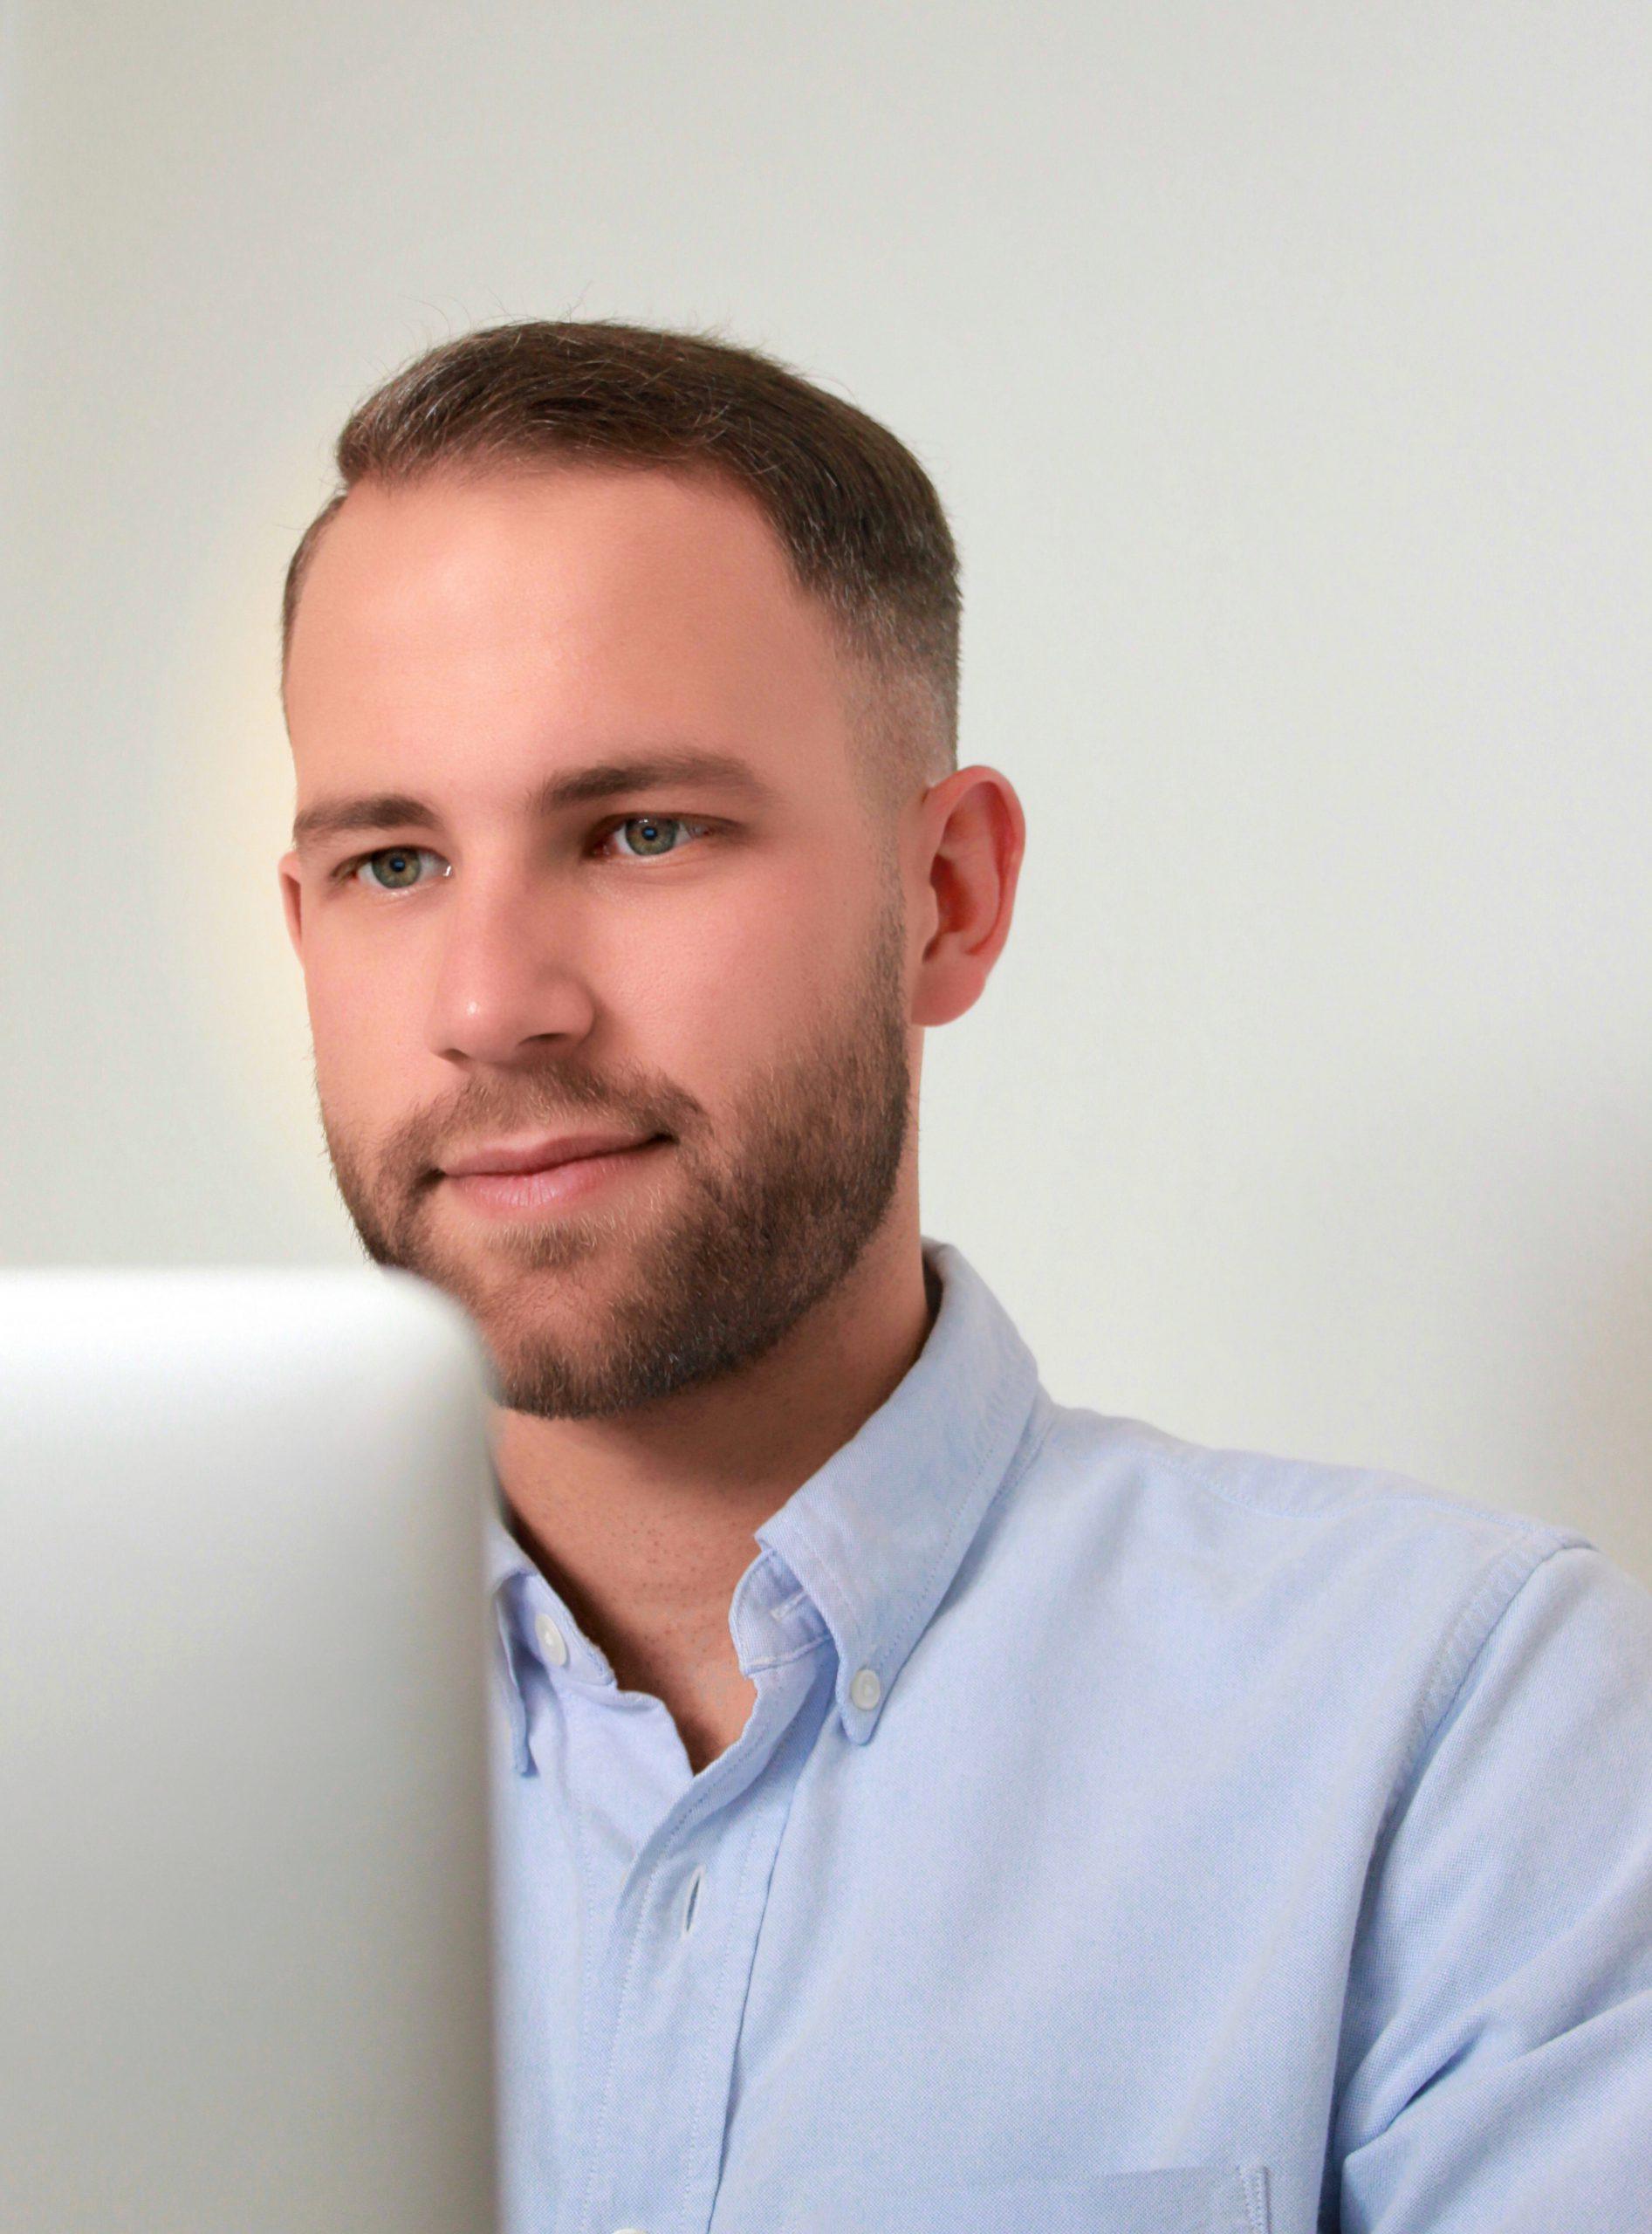 Mein Reiseberater - Reisebüro Sven Breunung